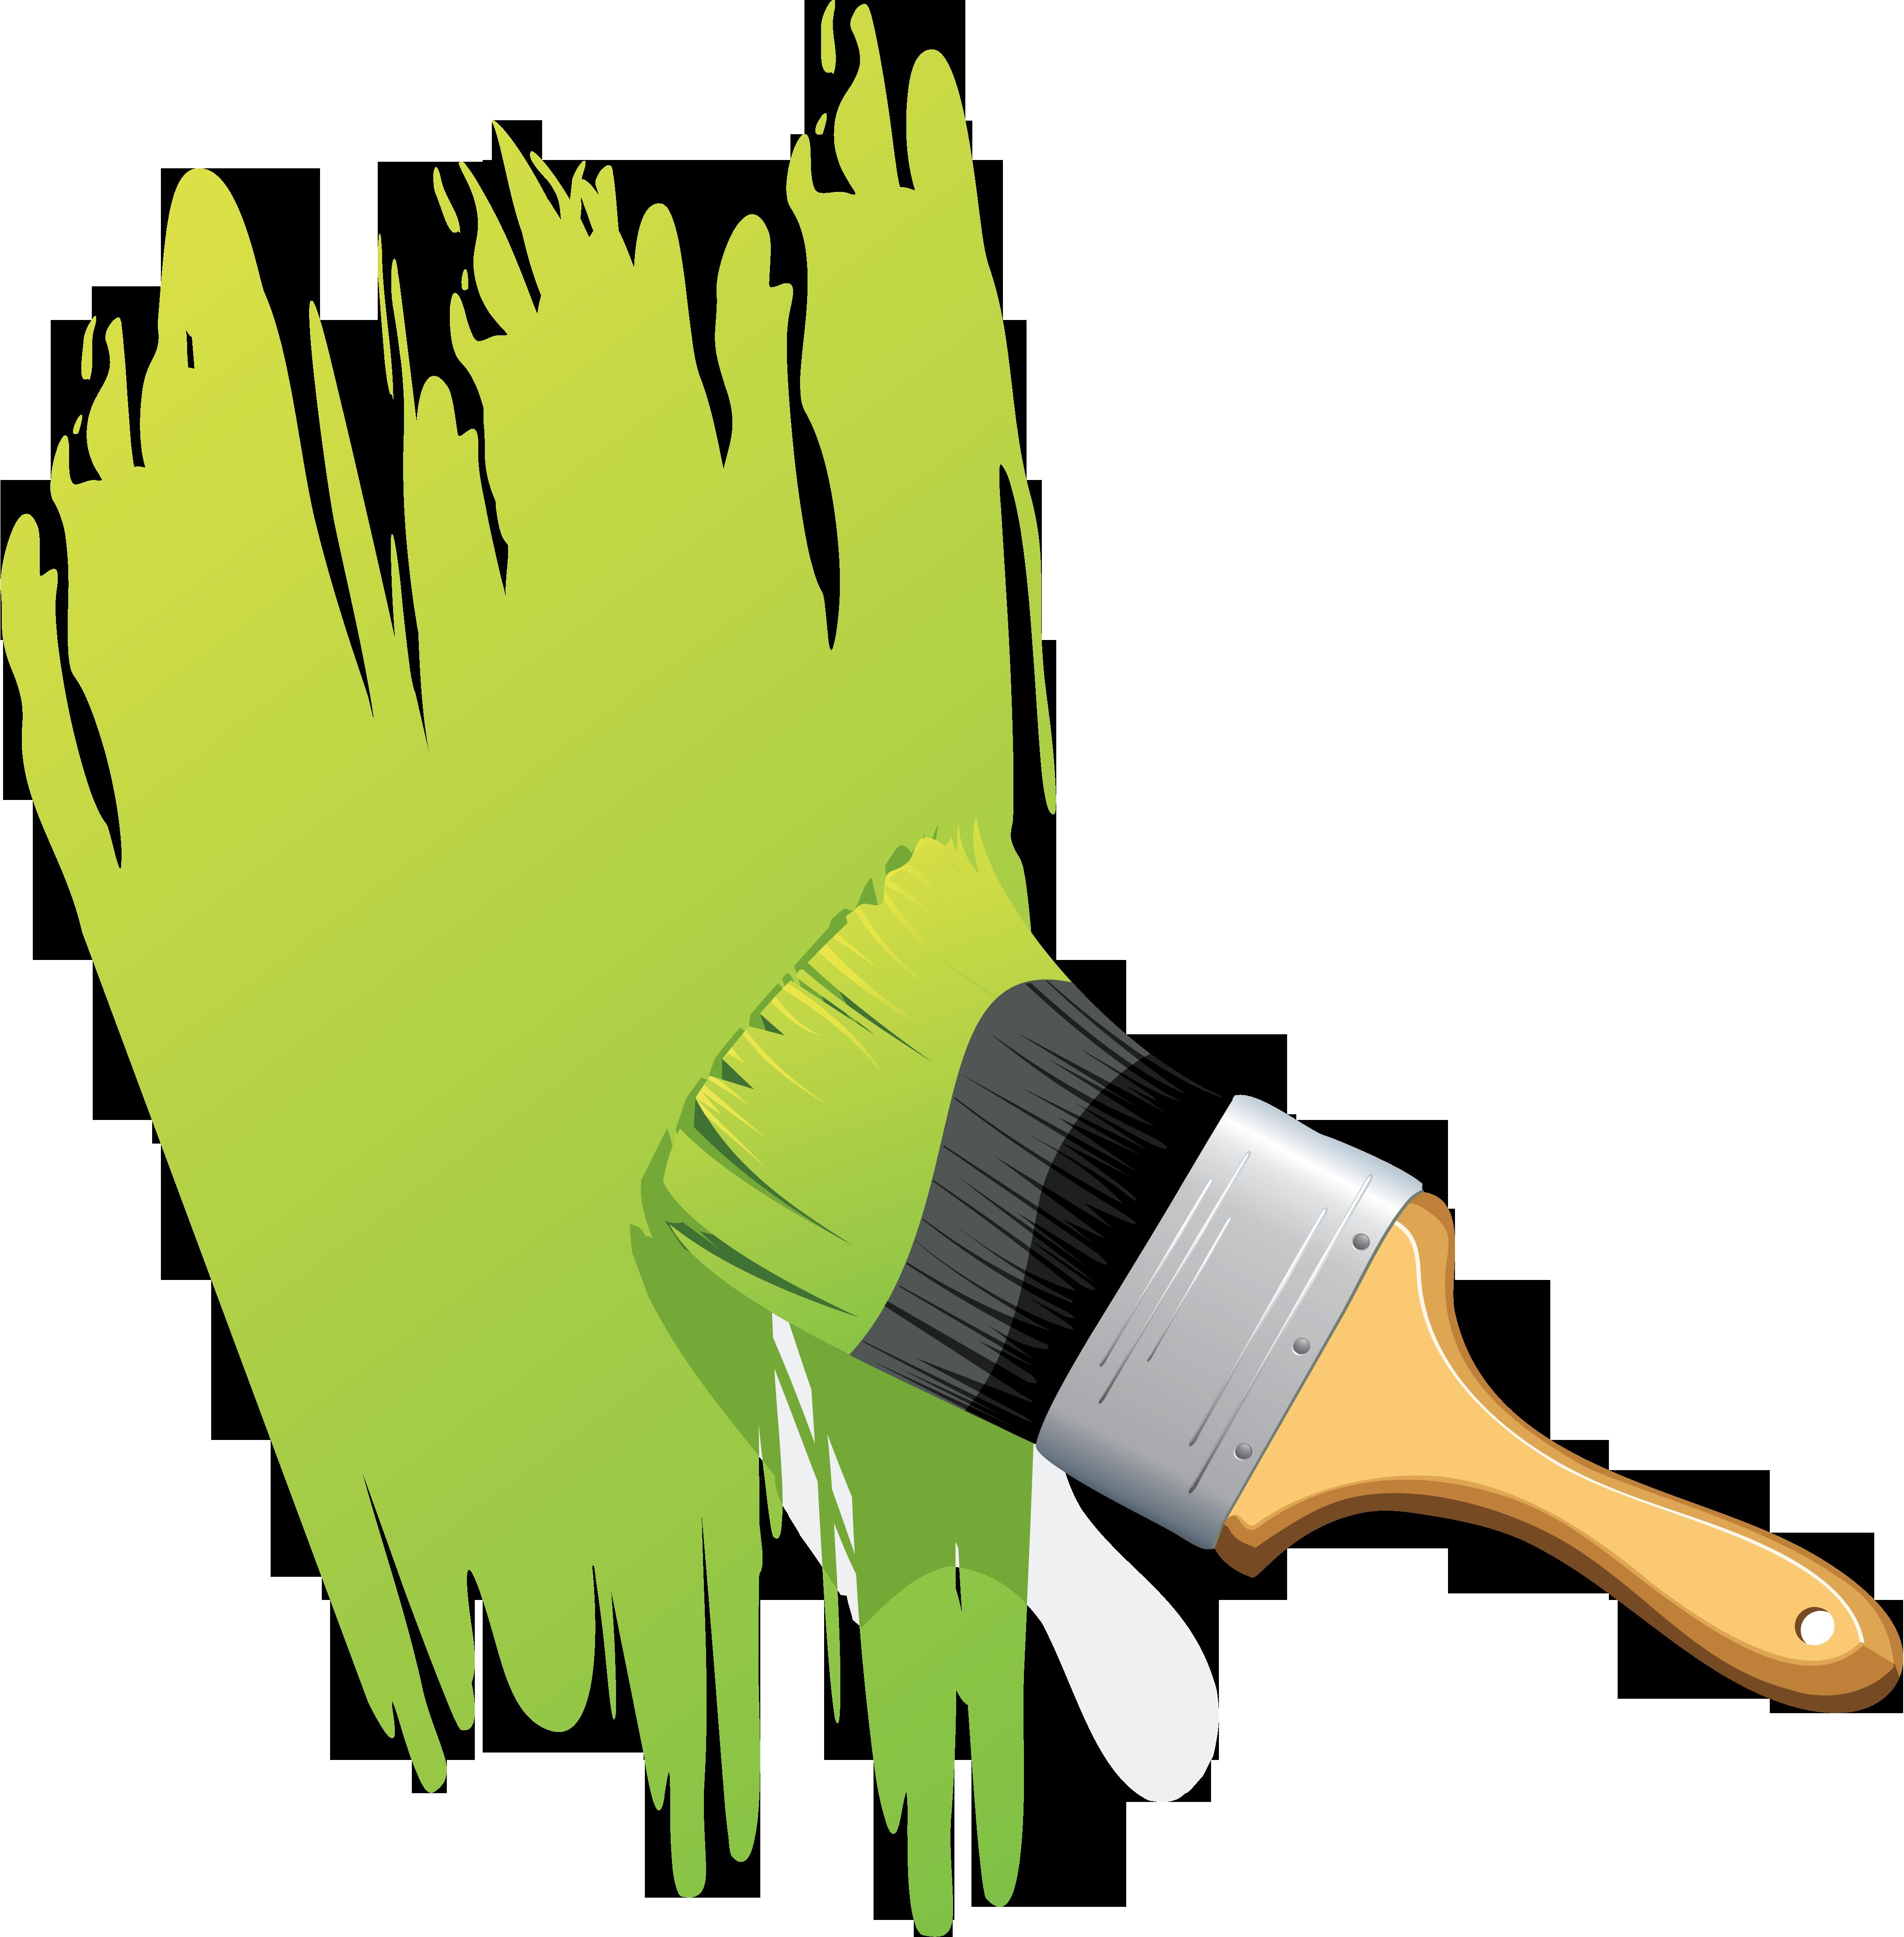 Paint Brush PNG Image - PurePNG | Free transparent CC0 PNG ...